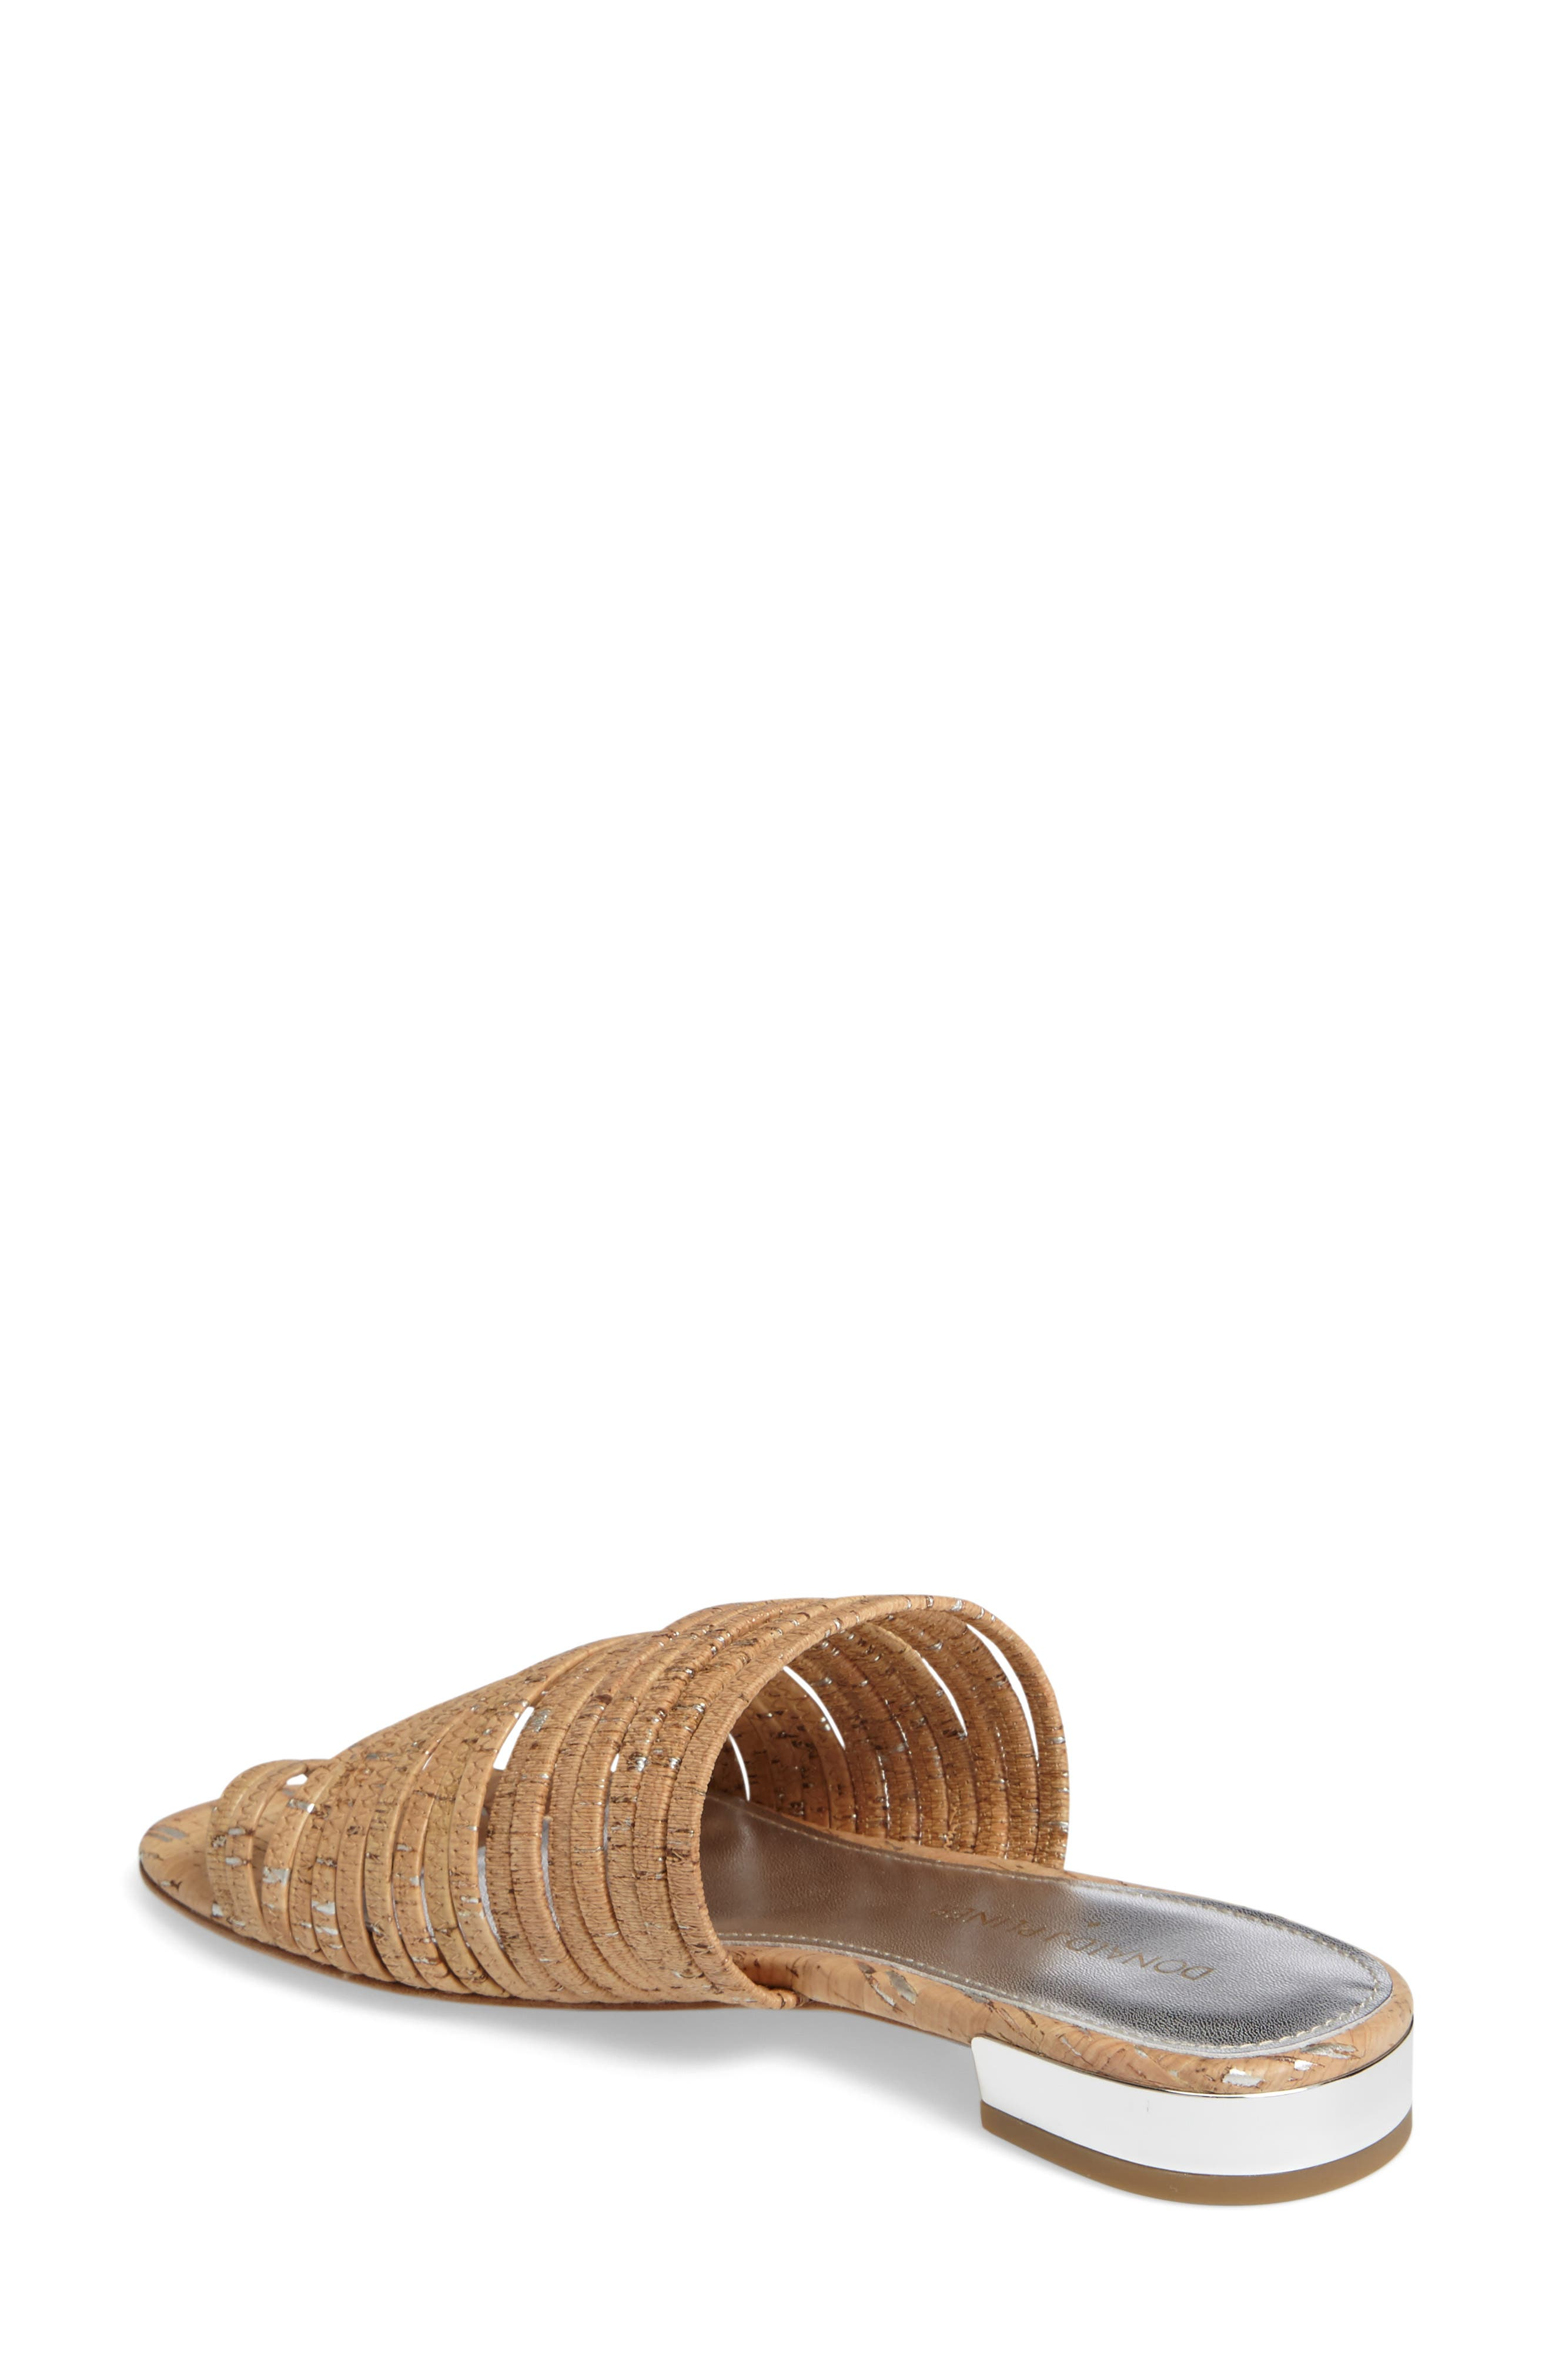 Alternate Image 2  - Donald J Pliner Frea Strappy Sandal (Women)